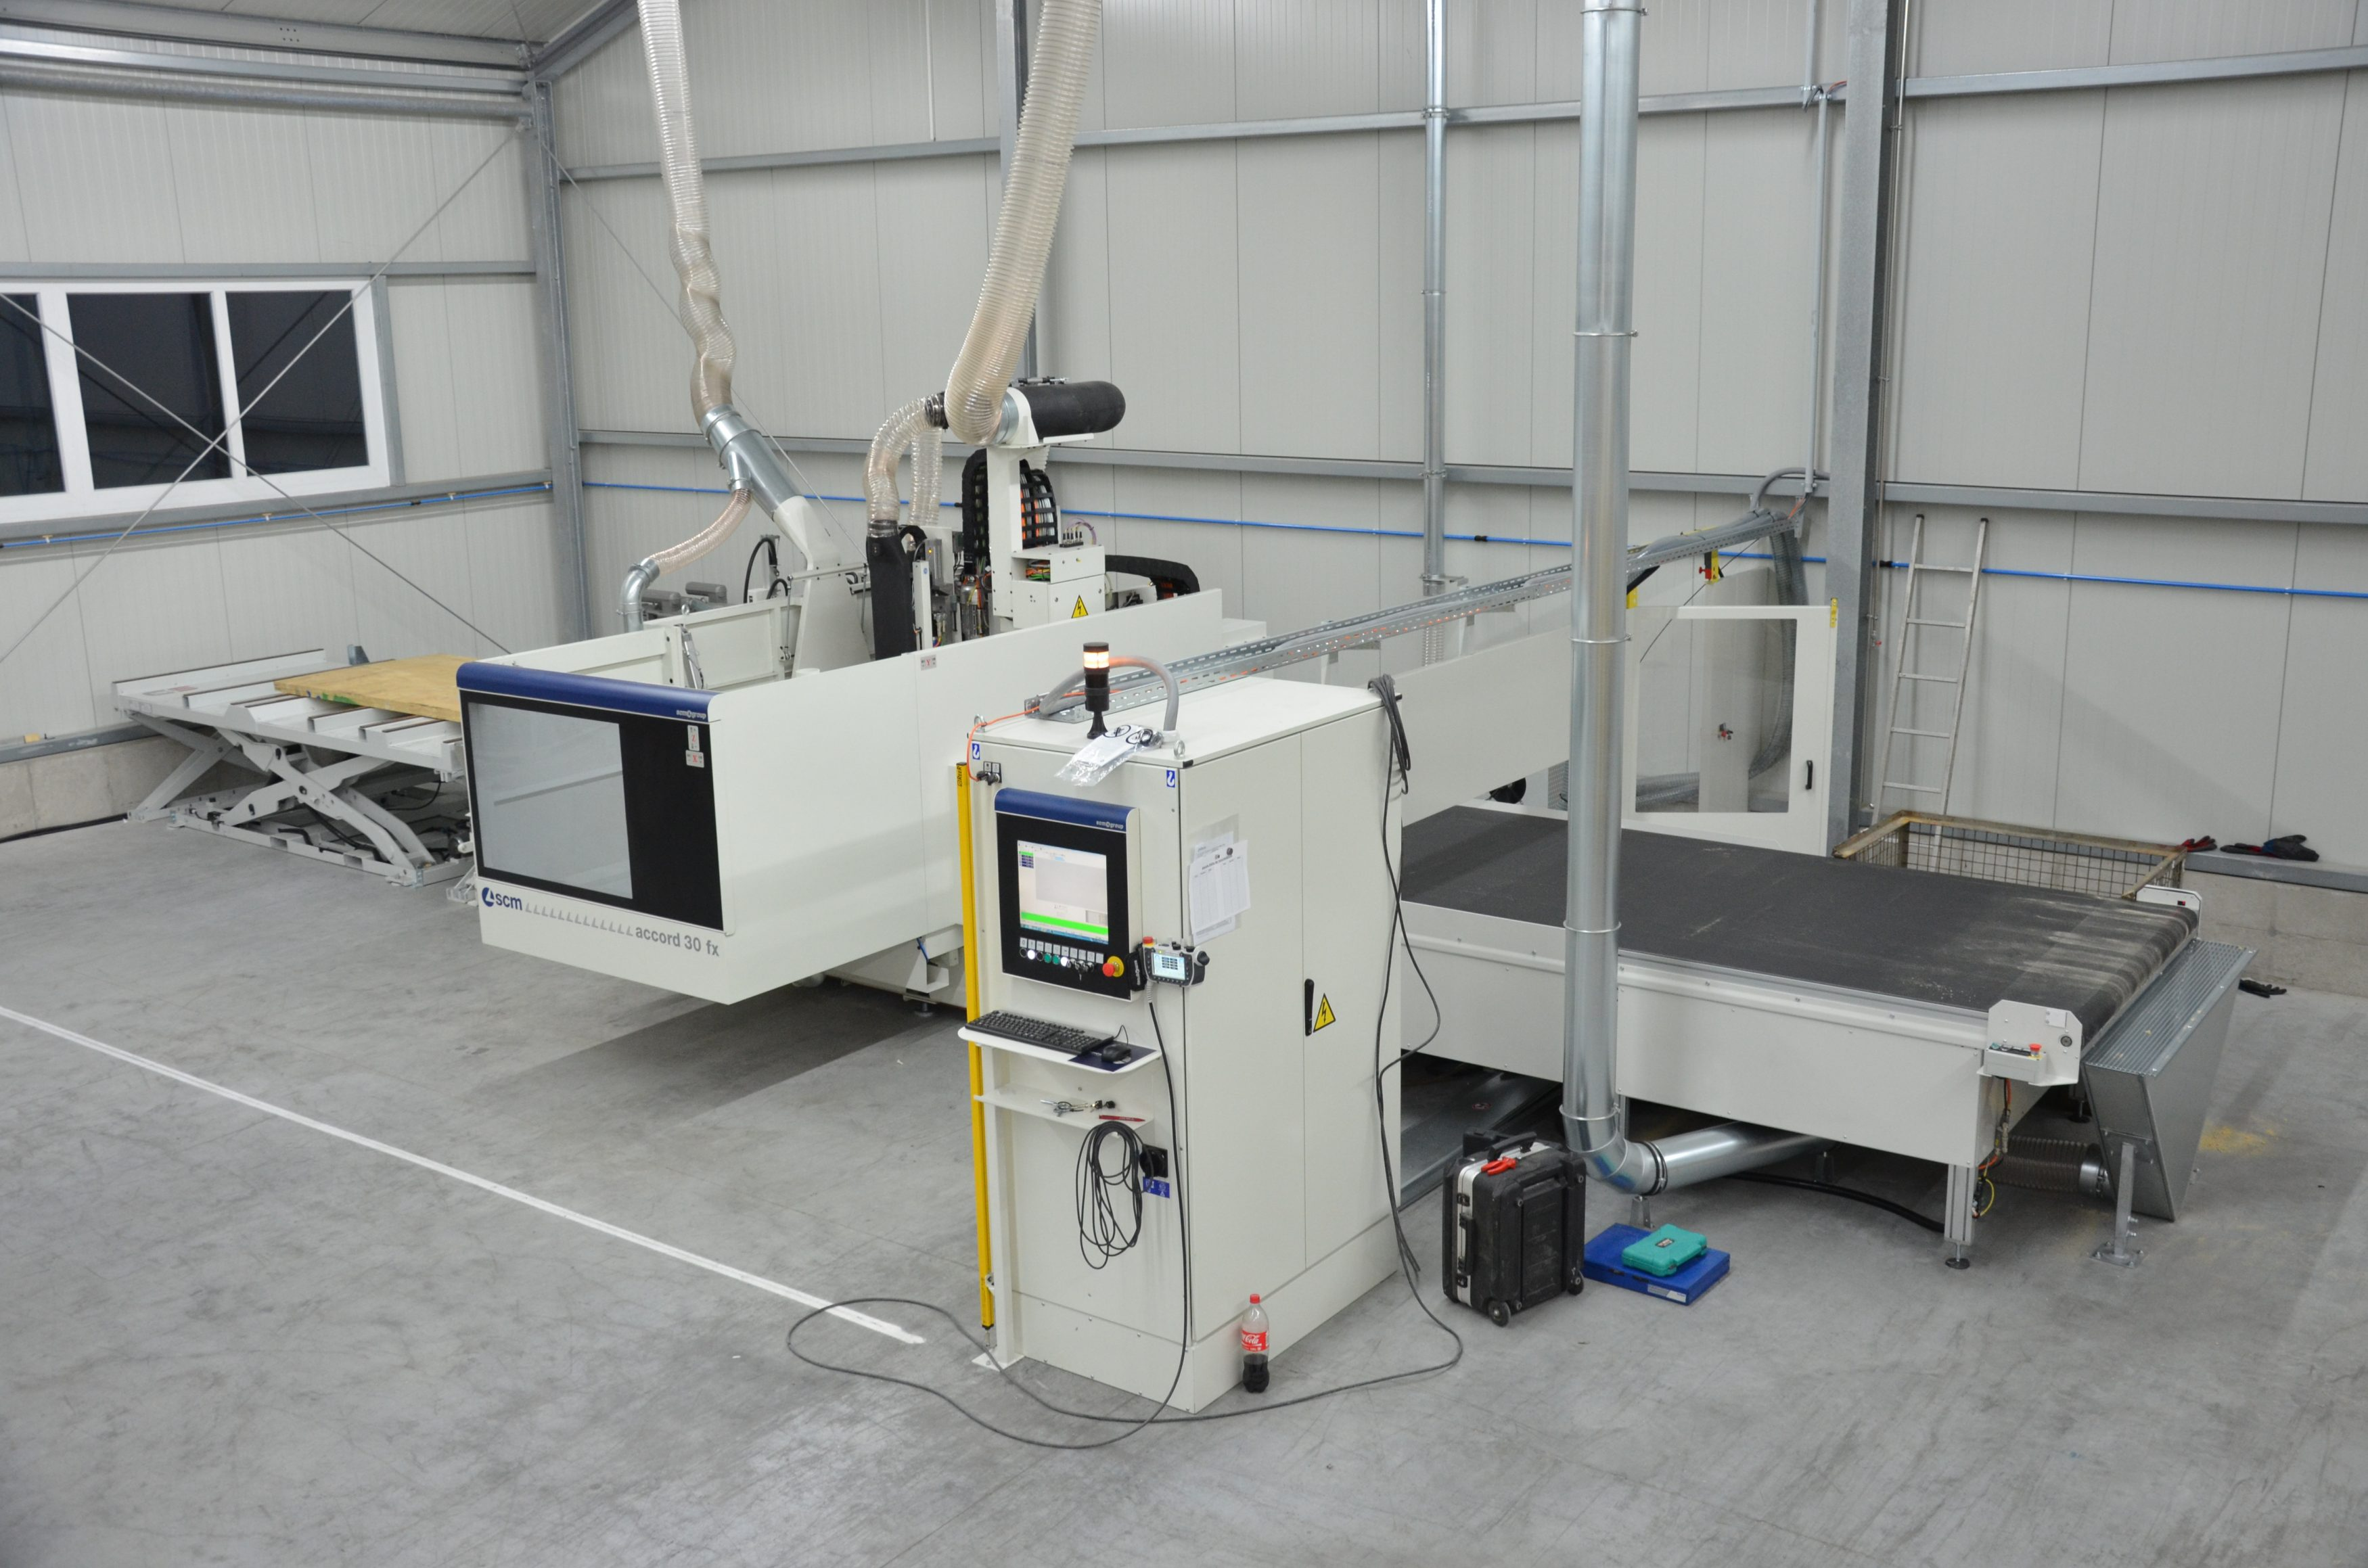 Accord 30 CNC-Bearbeitungszentrum